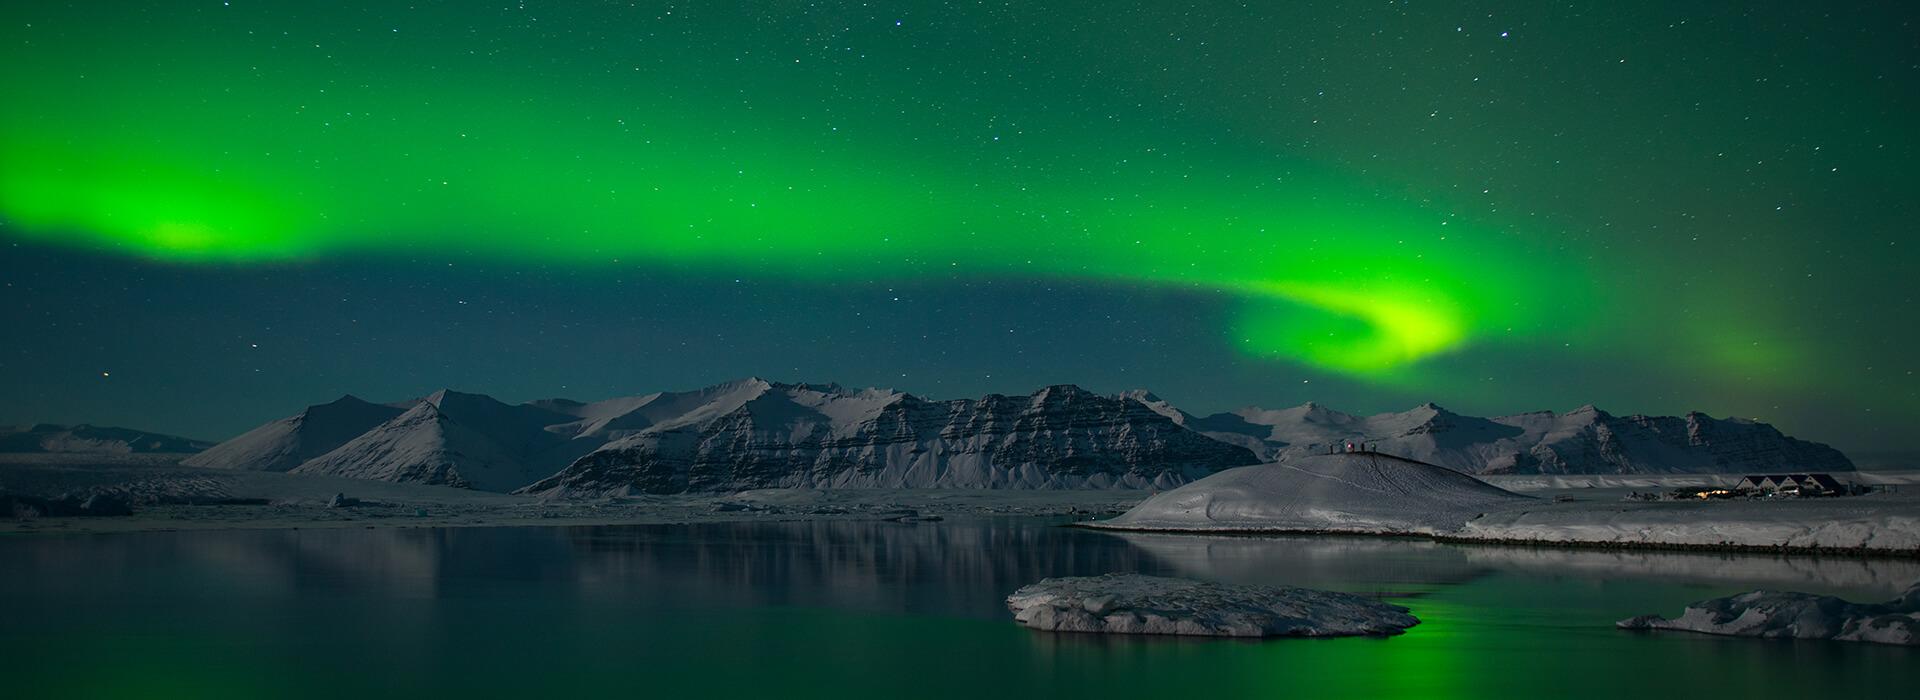 Jokulsarlon Northern Lights, Iceland